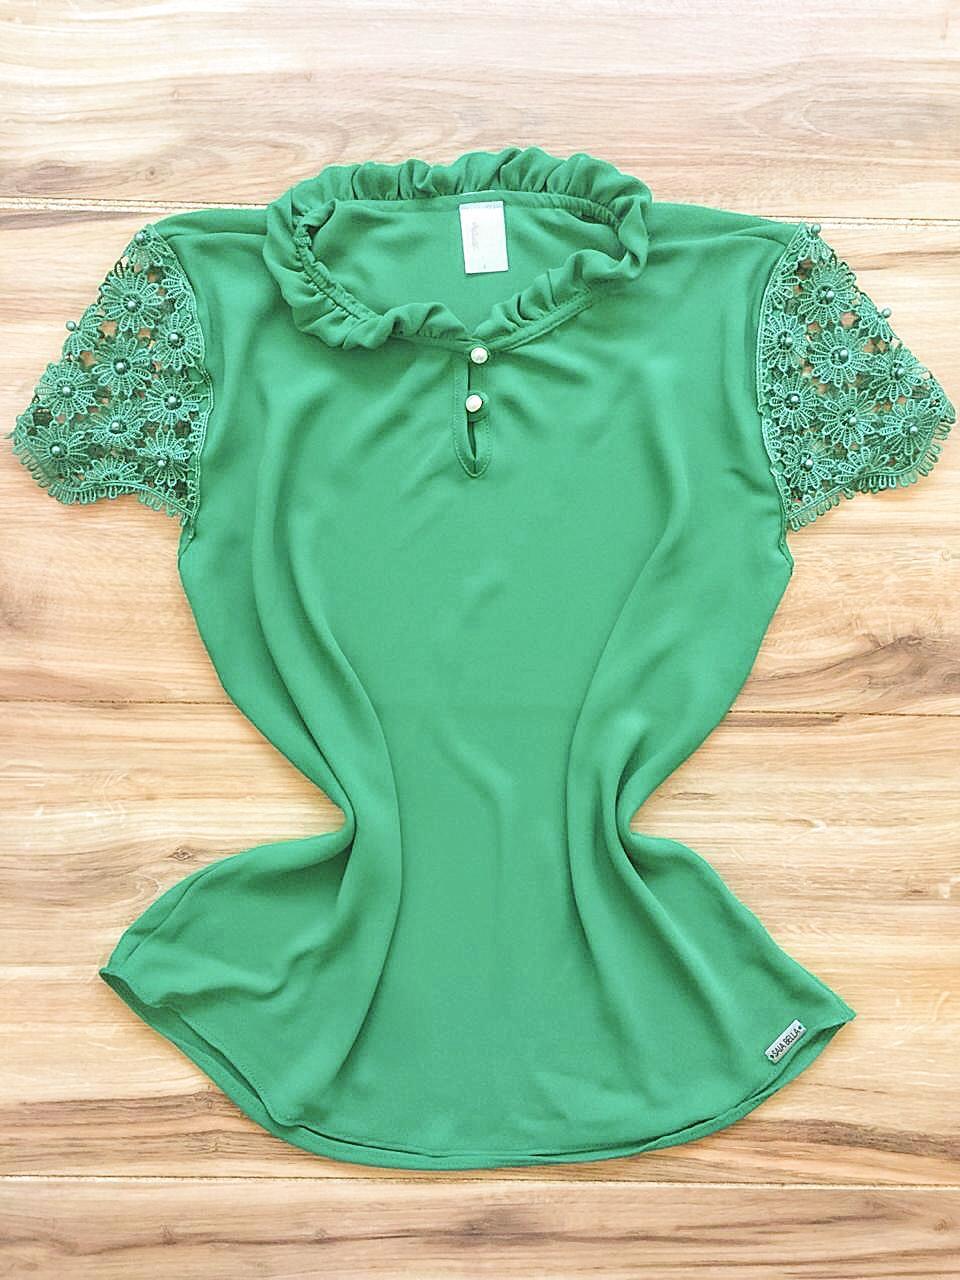 Blusa de Renda Saia Bella - SB9980 verde escuro